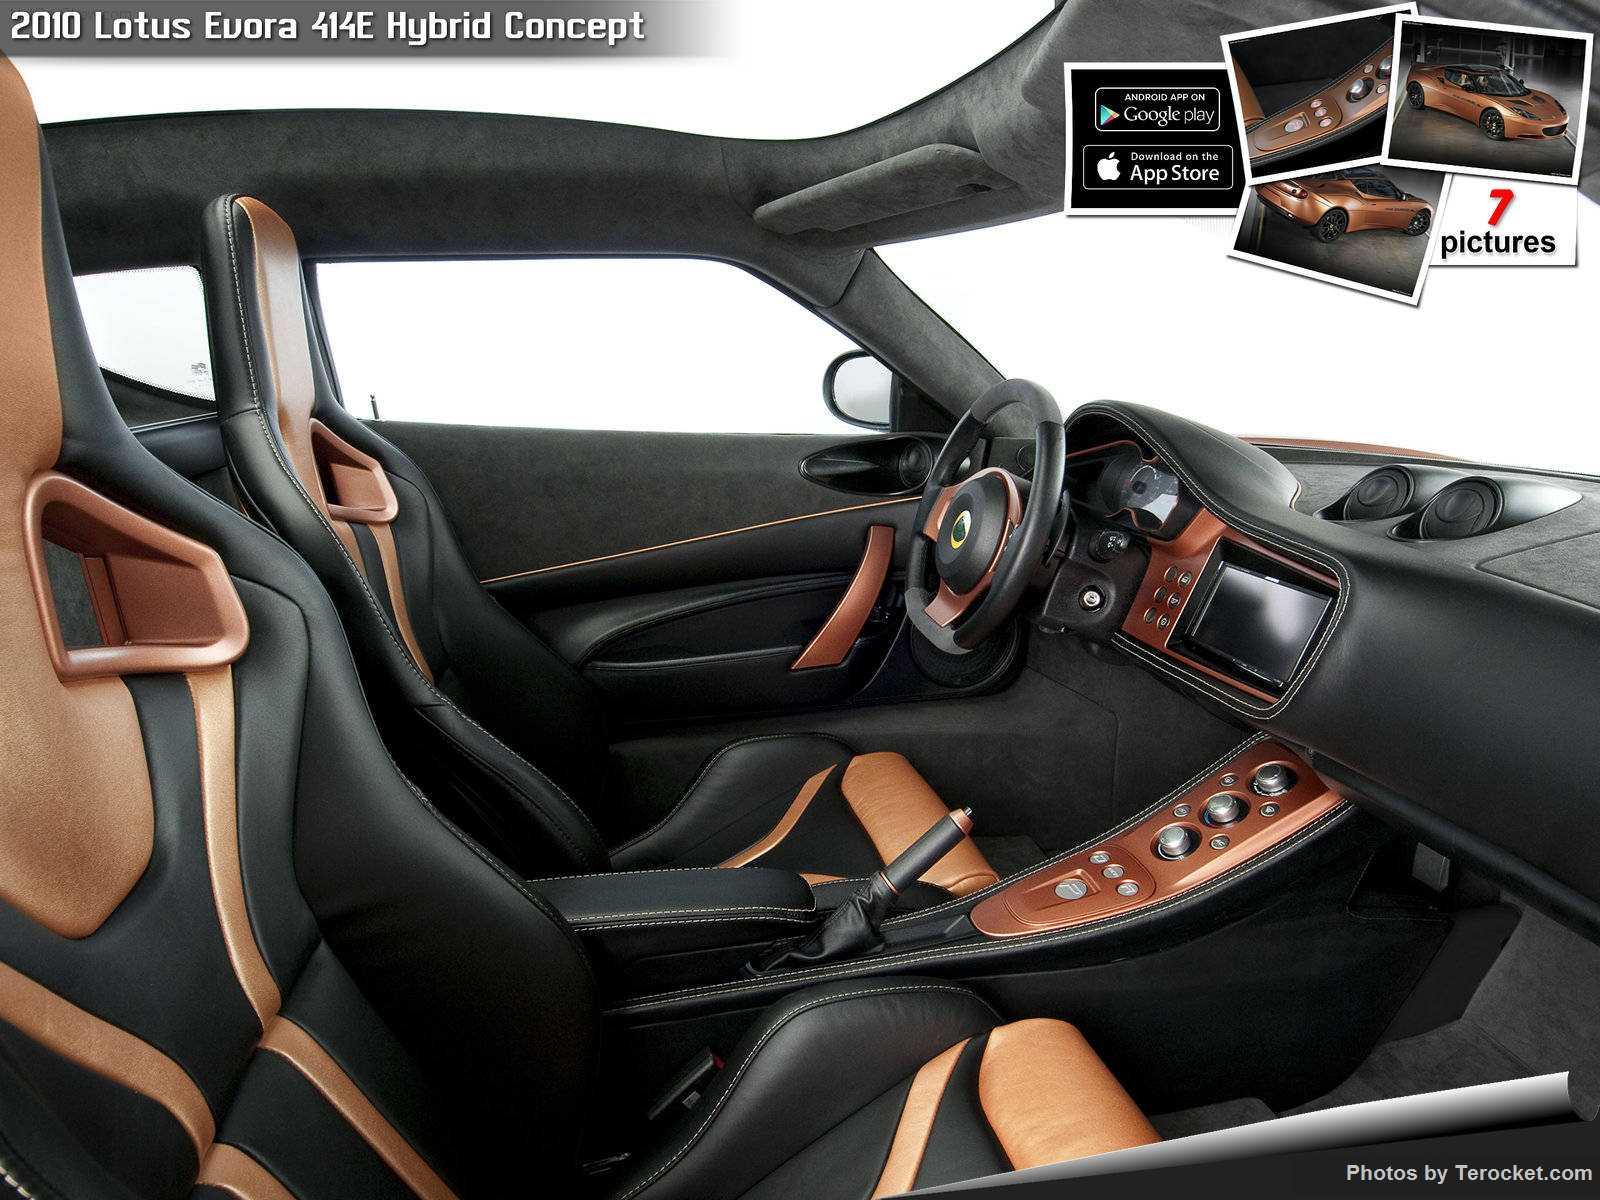 Hình ảnh siêu xe Lotus Evora 414E Hybrid Concept 2010 & nội ngoại thất